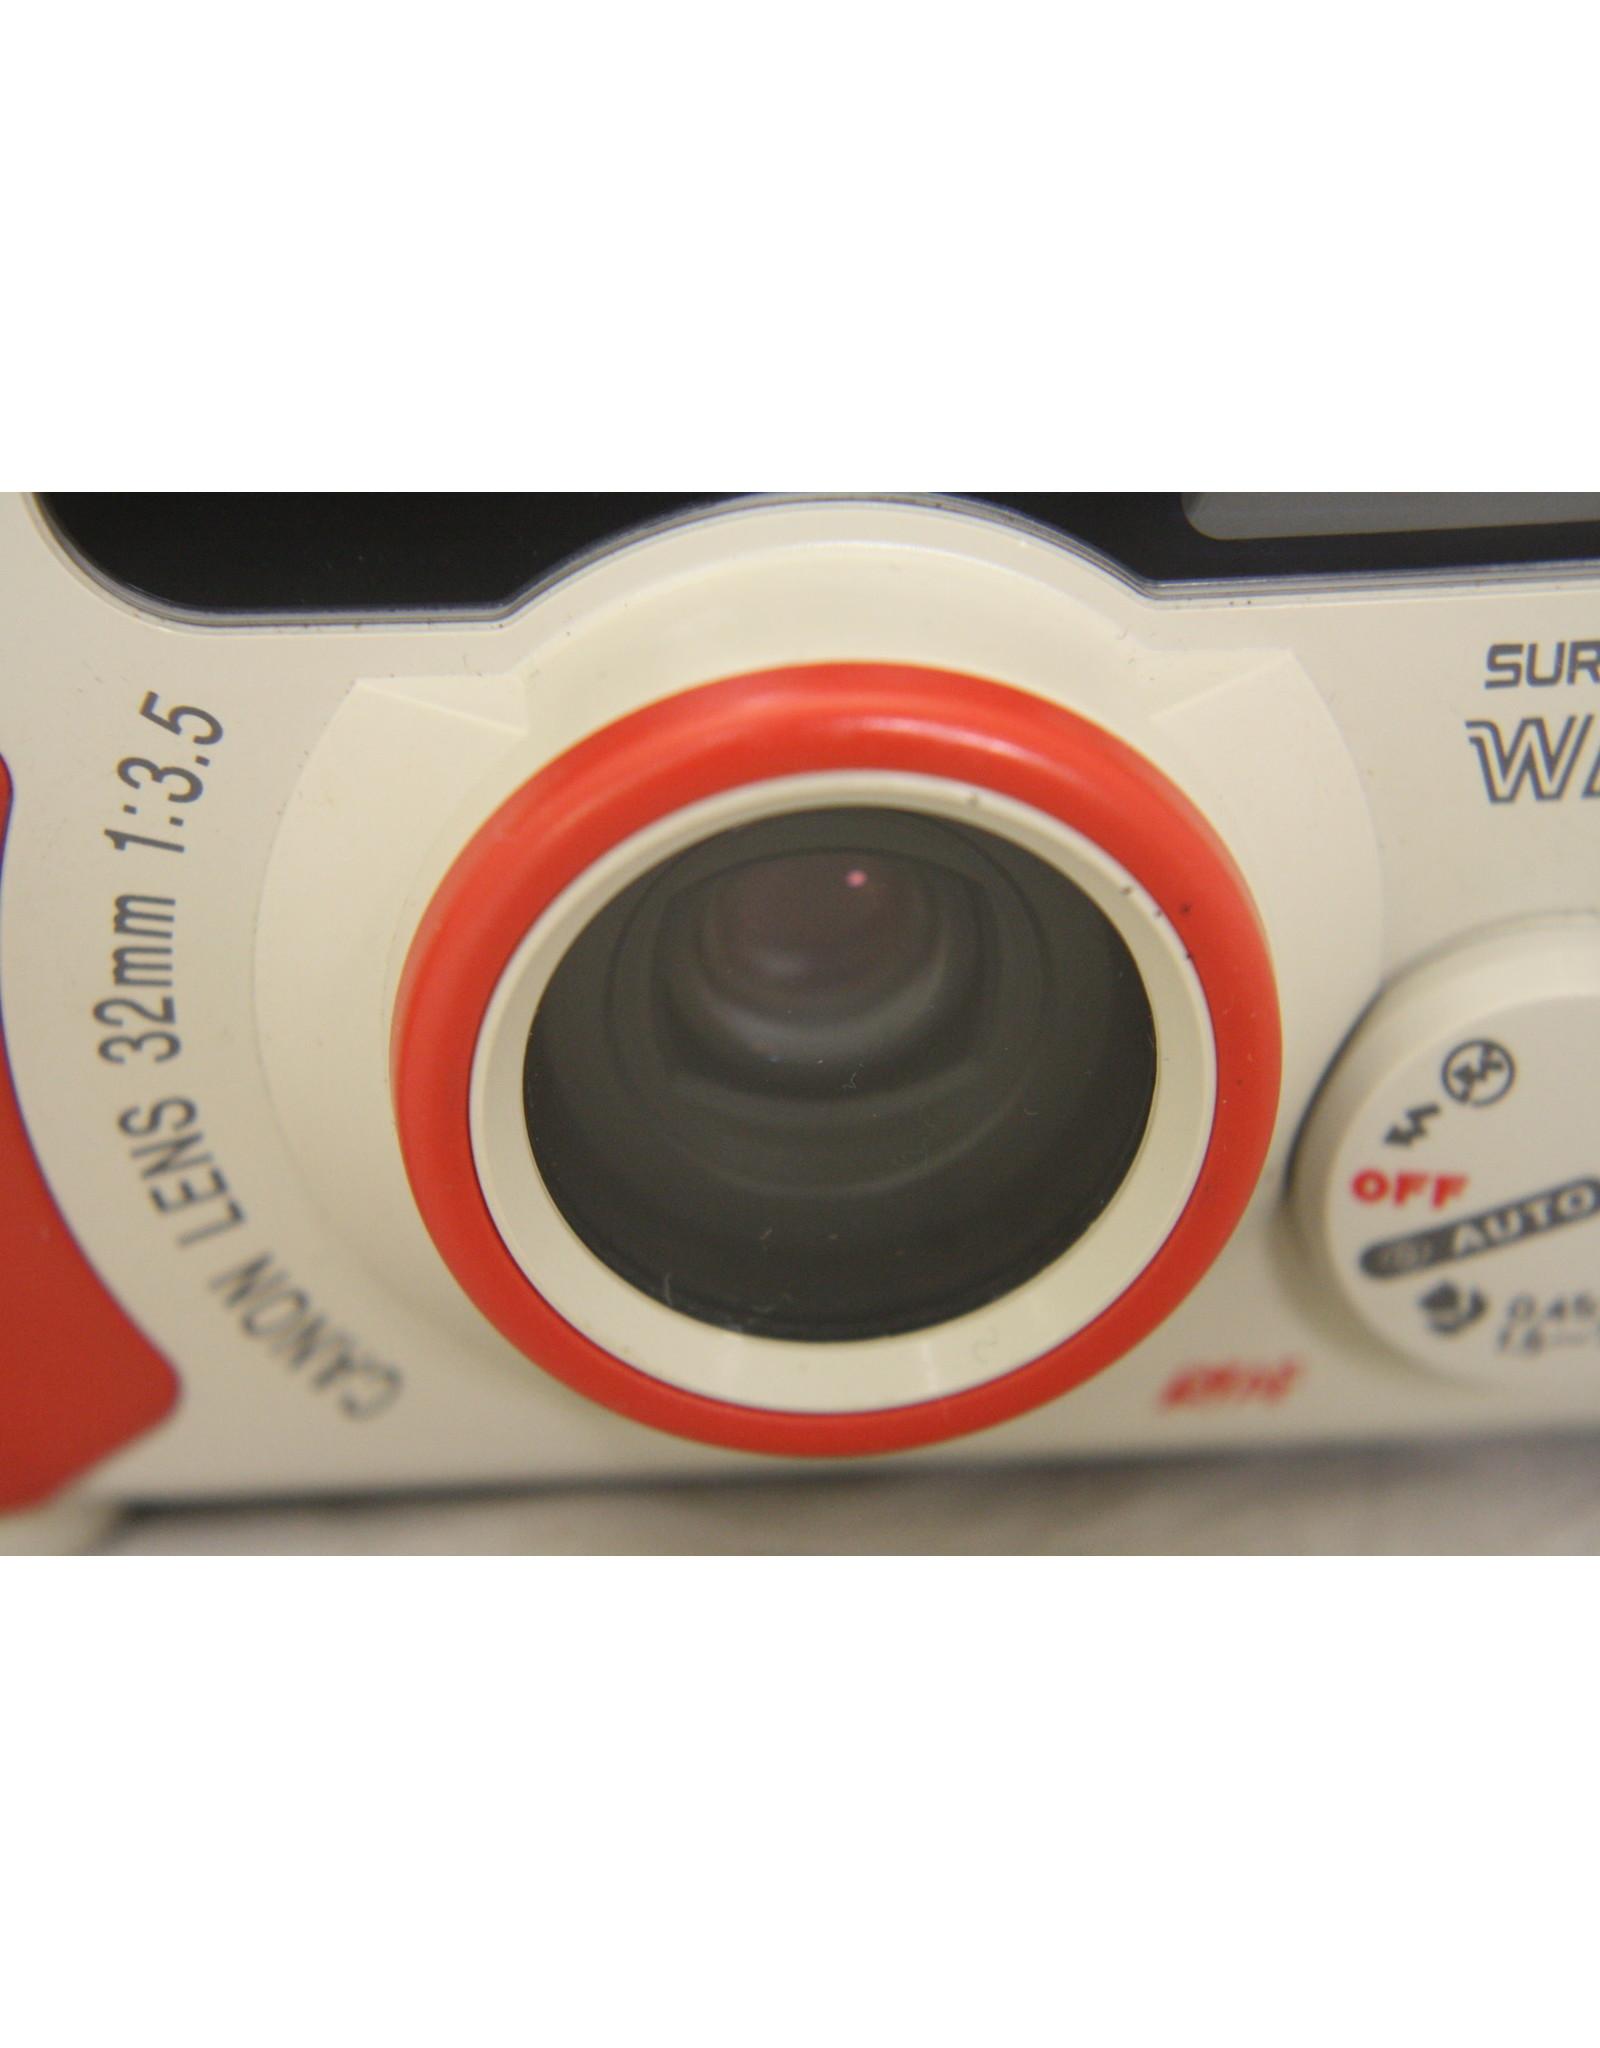 Canon Canon Sure Shot WP-1 w/ Case (Pre-Owned)